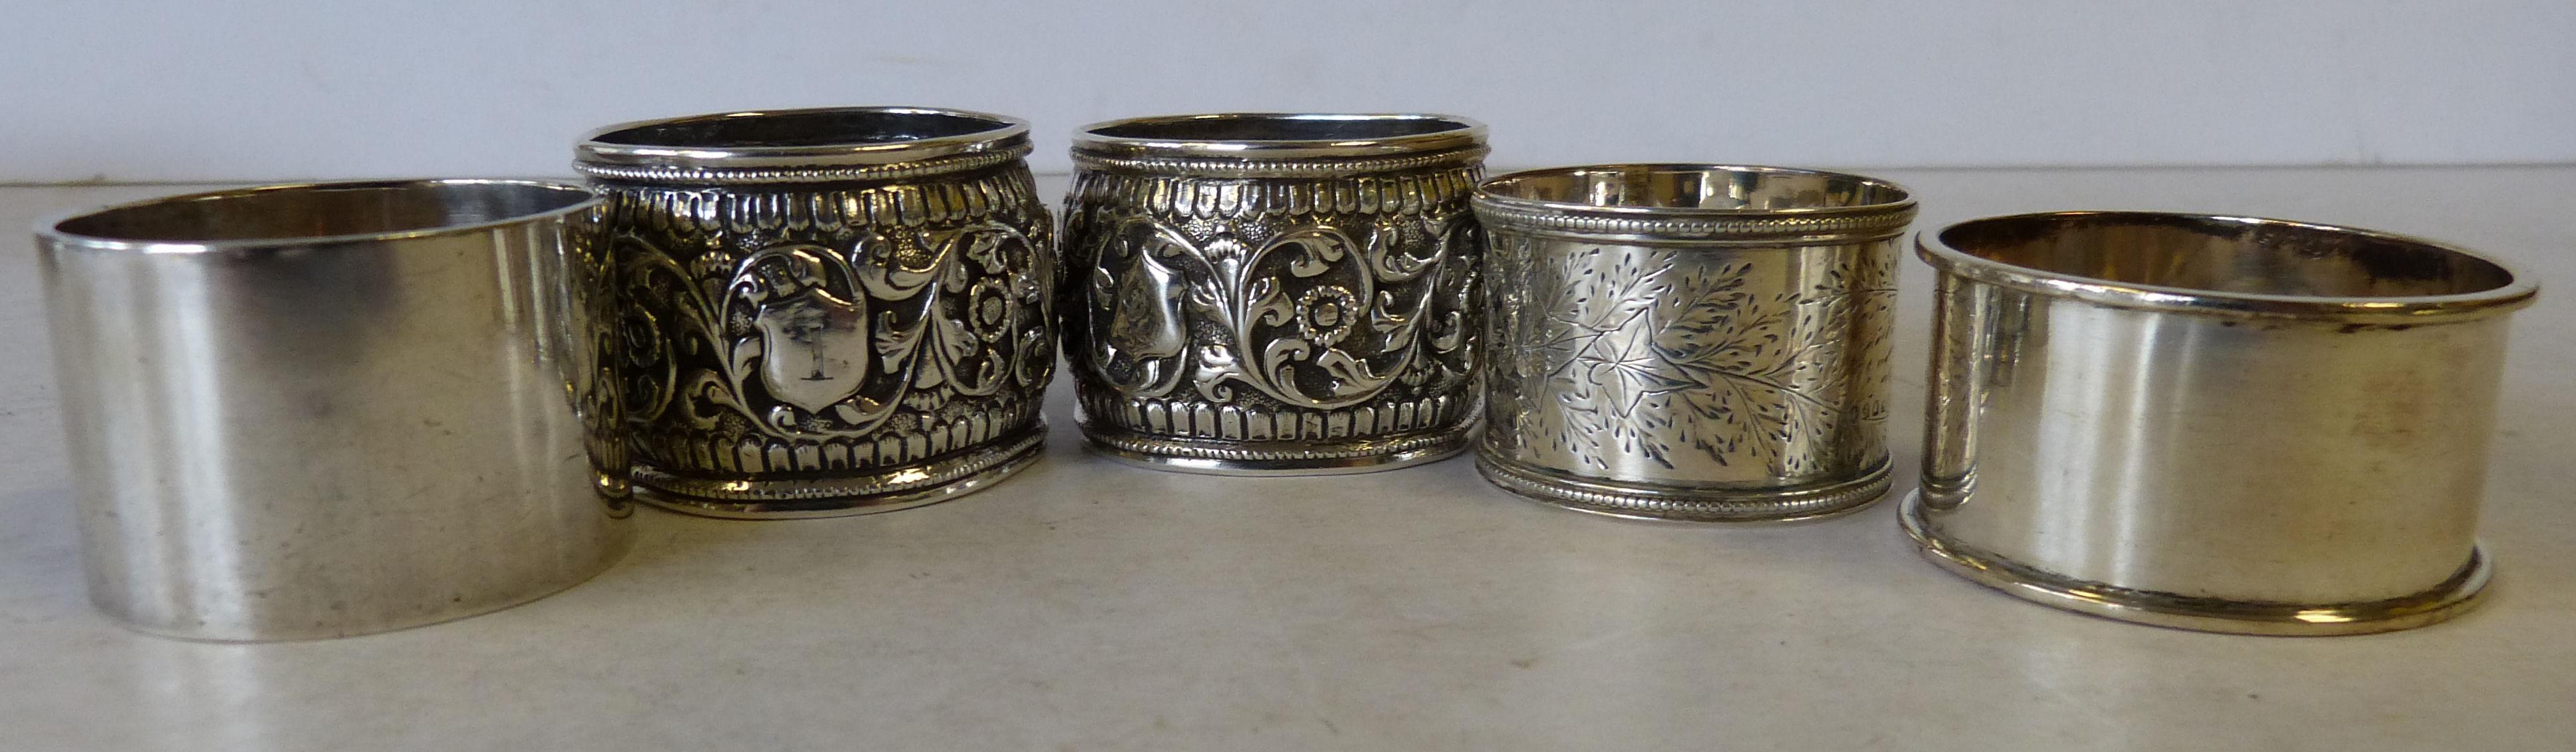 A Heavy Plain Sheffield Silver Napkin Ring, 2 other silver napkin rings and 2 other continental napkin rings